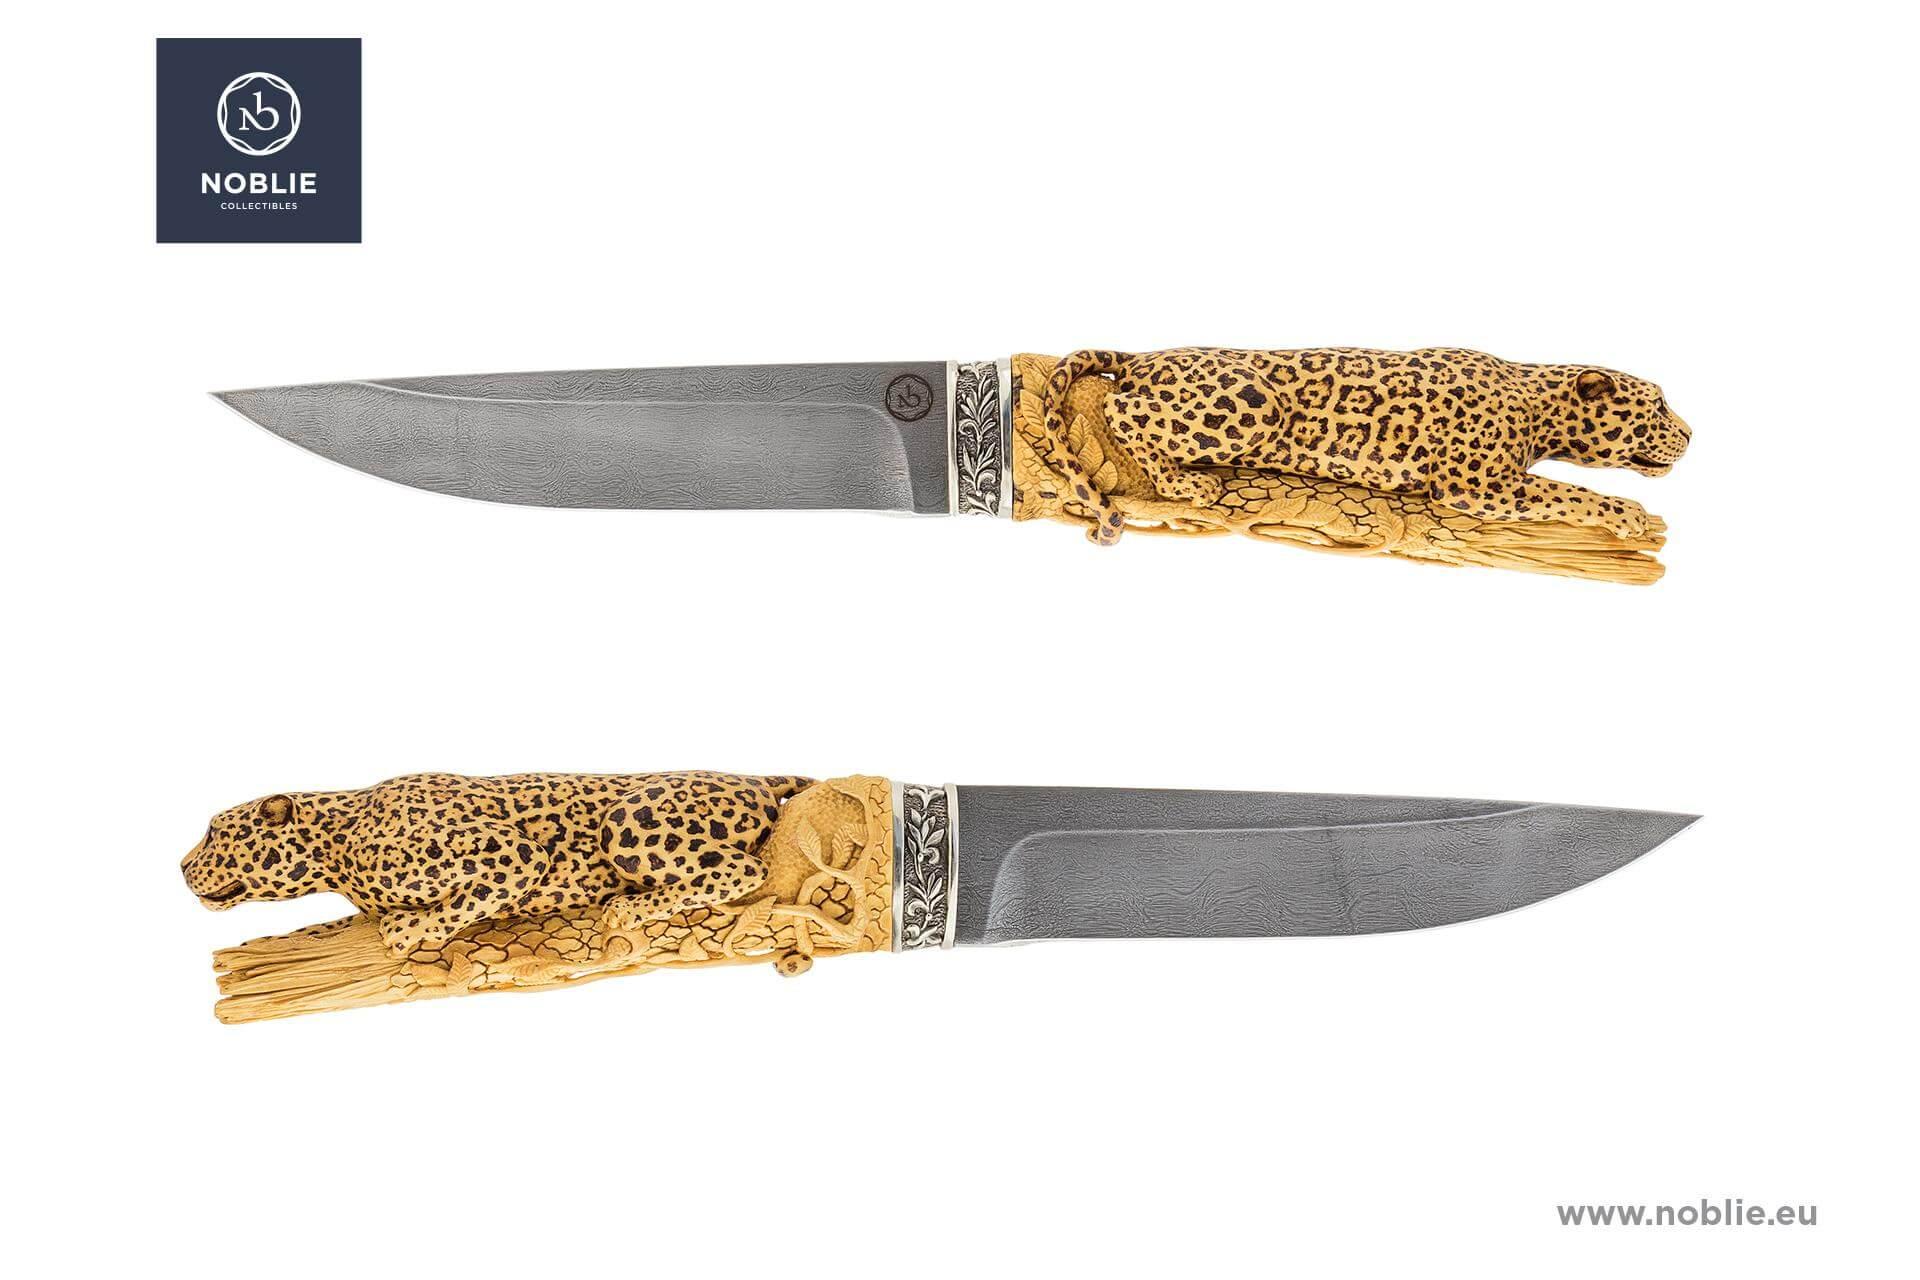 handmadeart knife